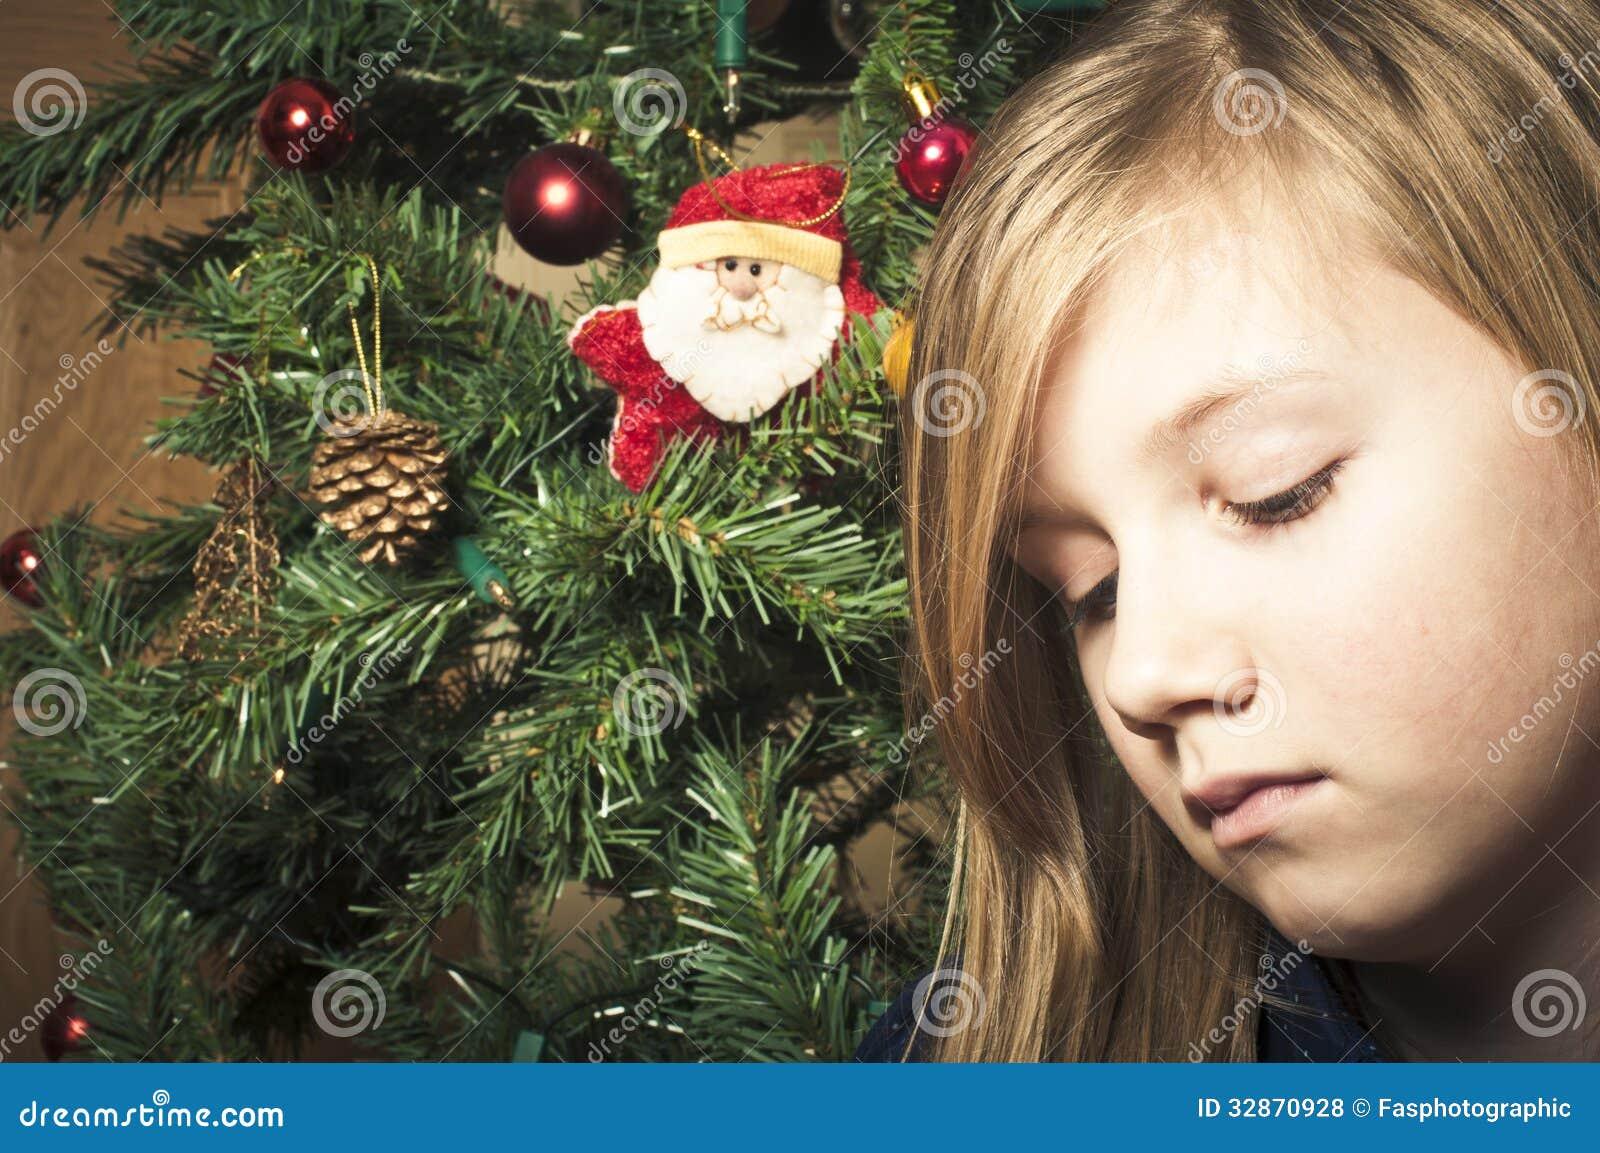 Sad Girl At Christmas Royalty Free Stock Photos - Image: 32870928